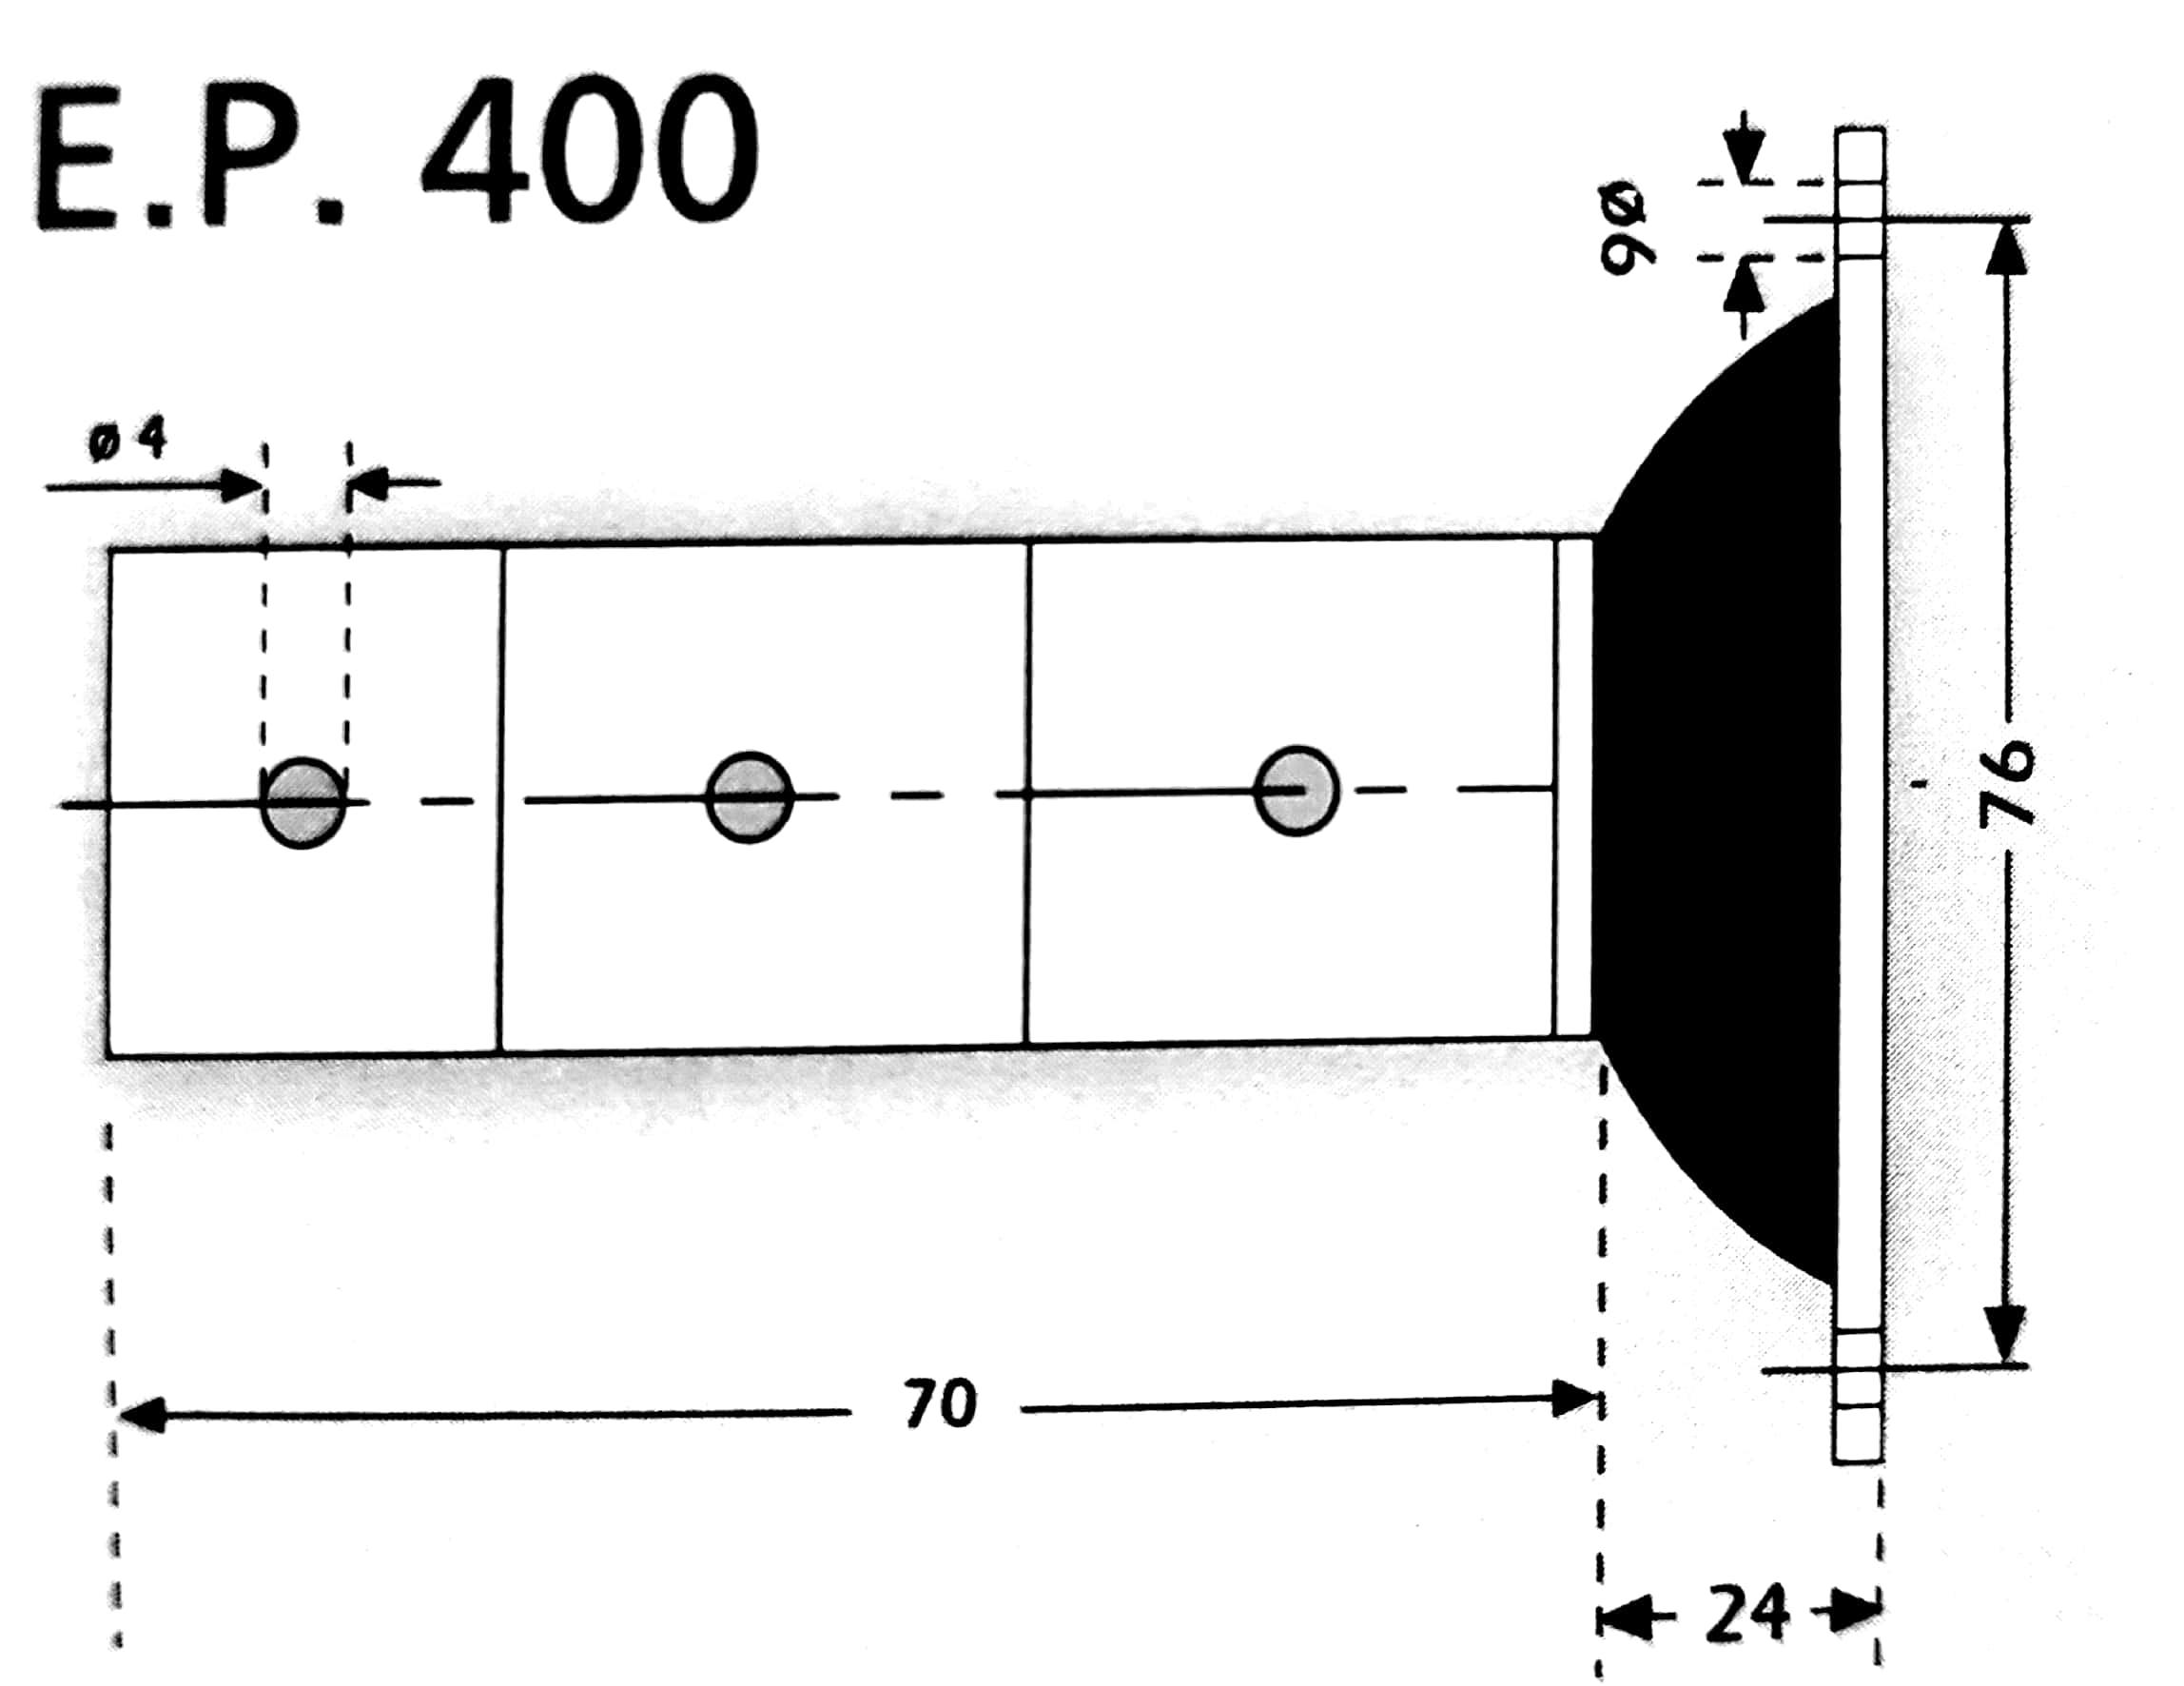 Custom EP400 wall vibration isolation mount